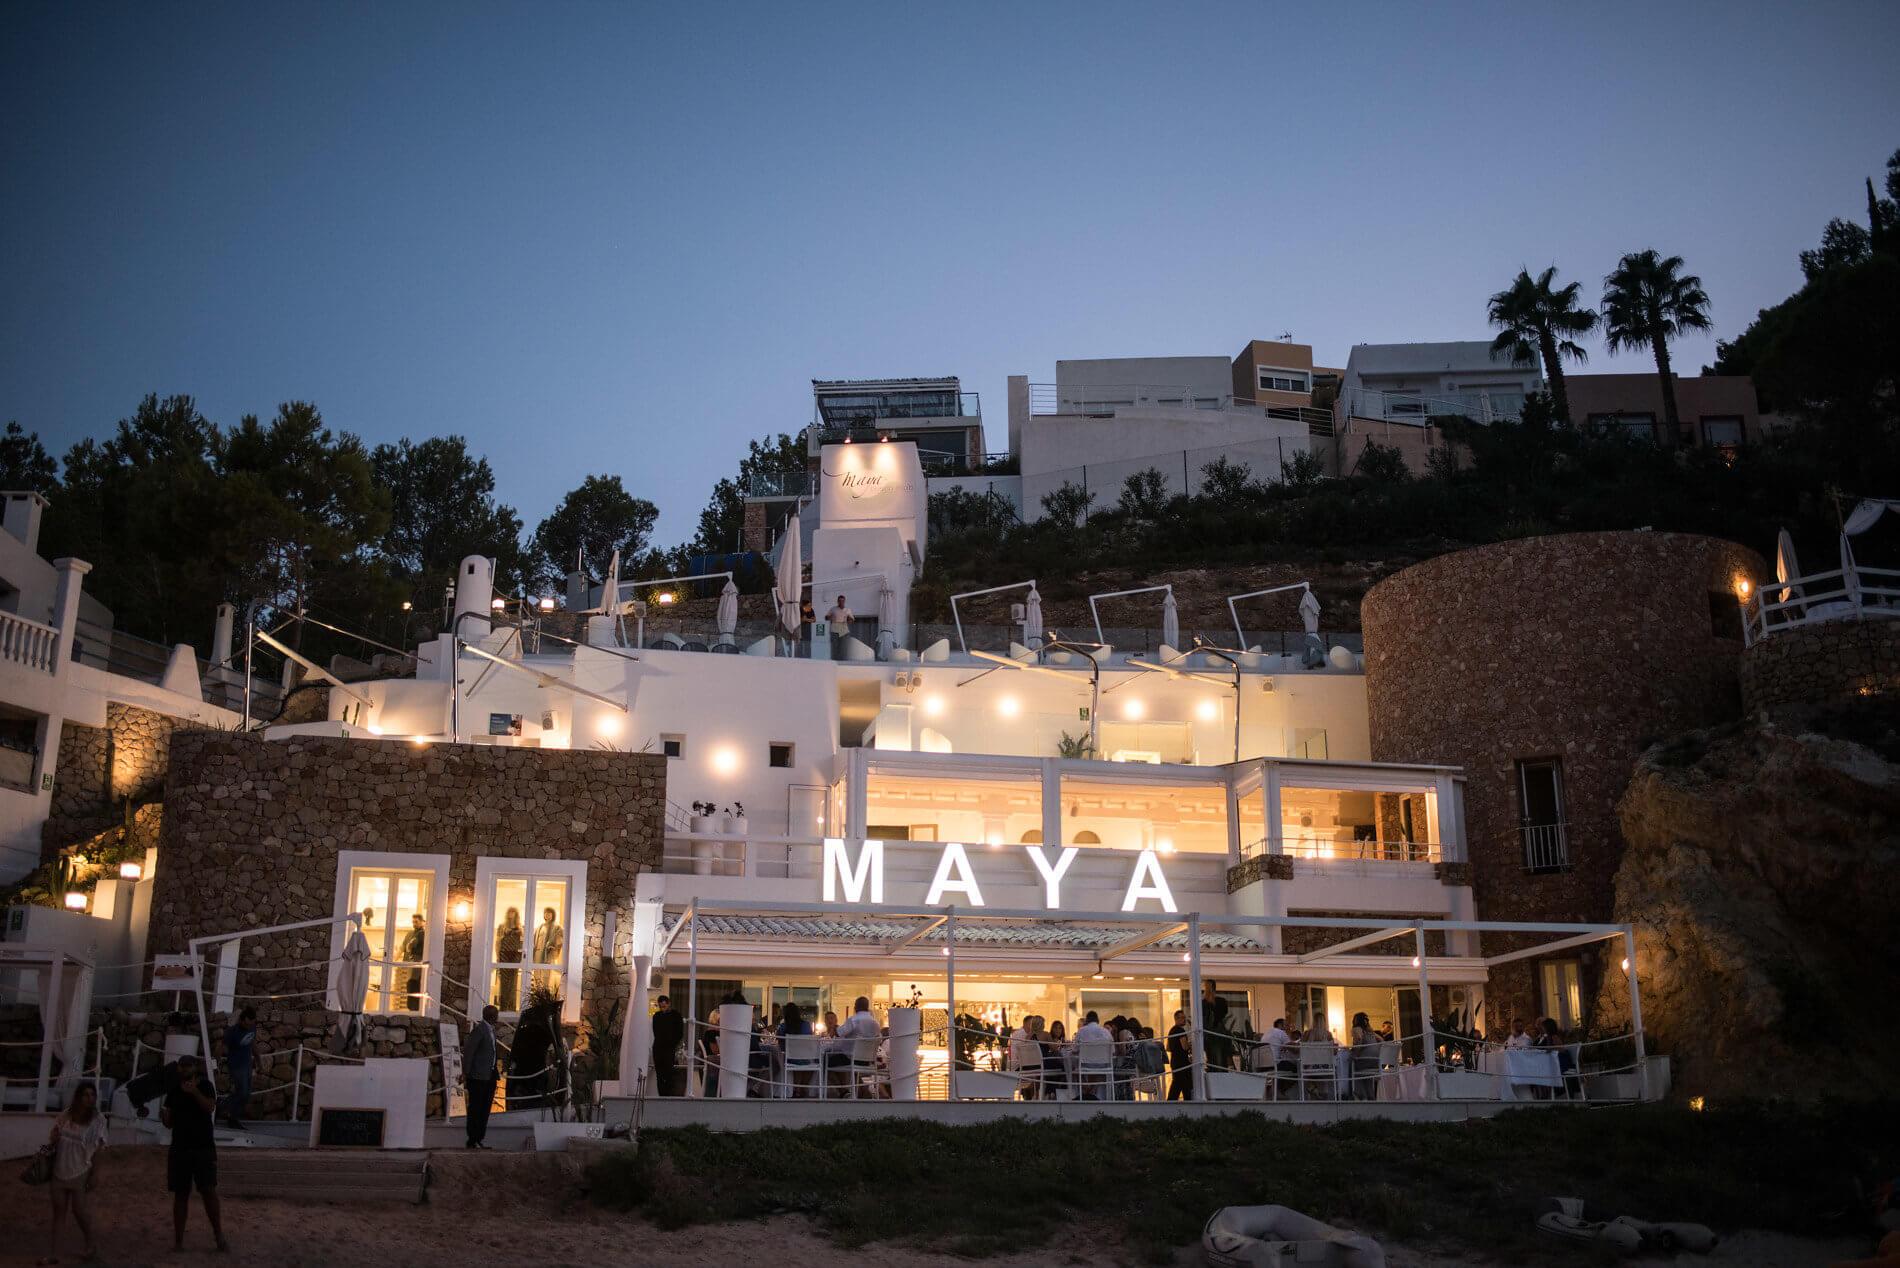 https://www.white-ibiza.com/wp-content/uploads/2020/03/ibiza-wedding-venue-maya-beach-club-2020-13.jpg